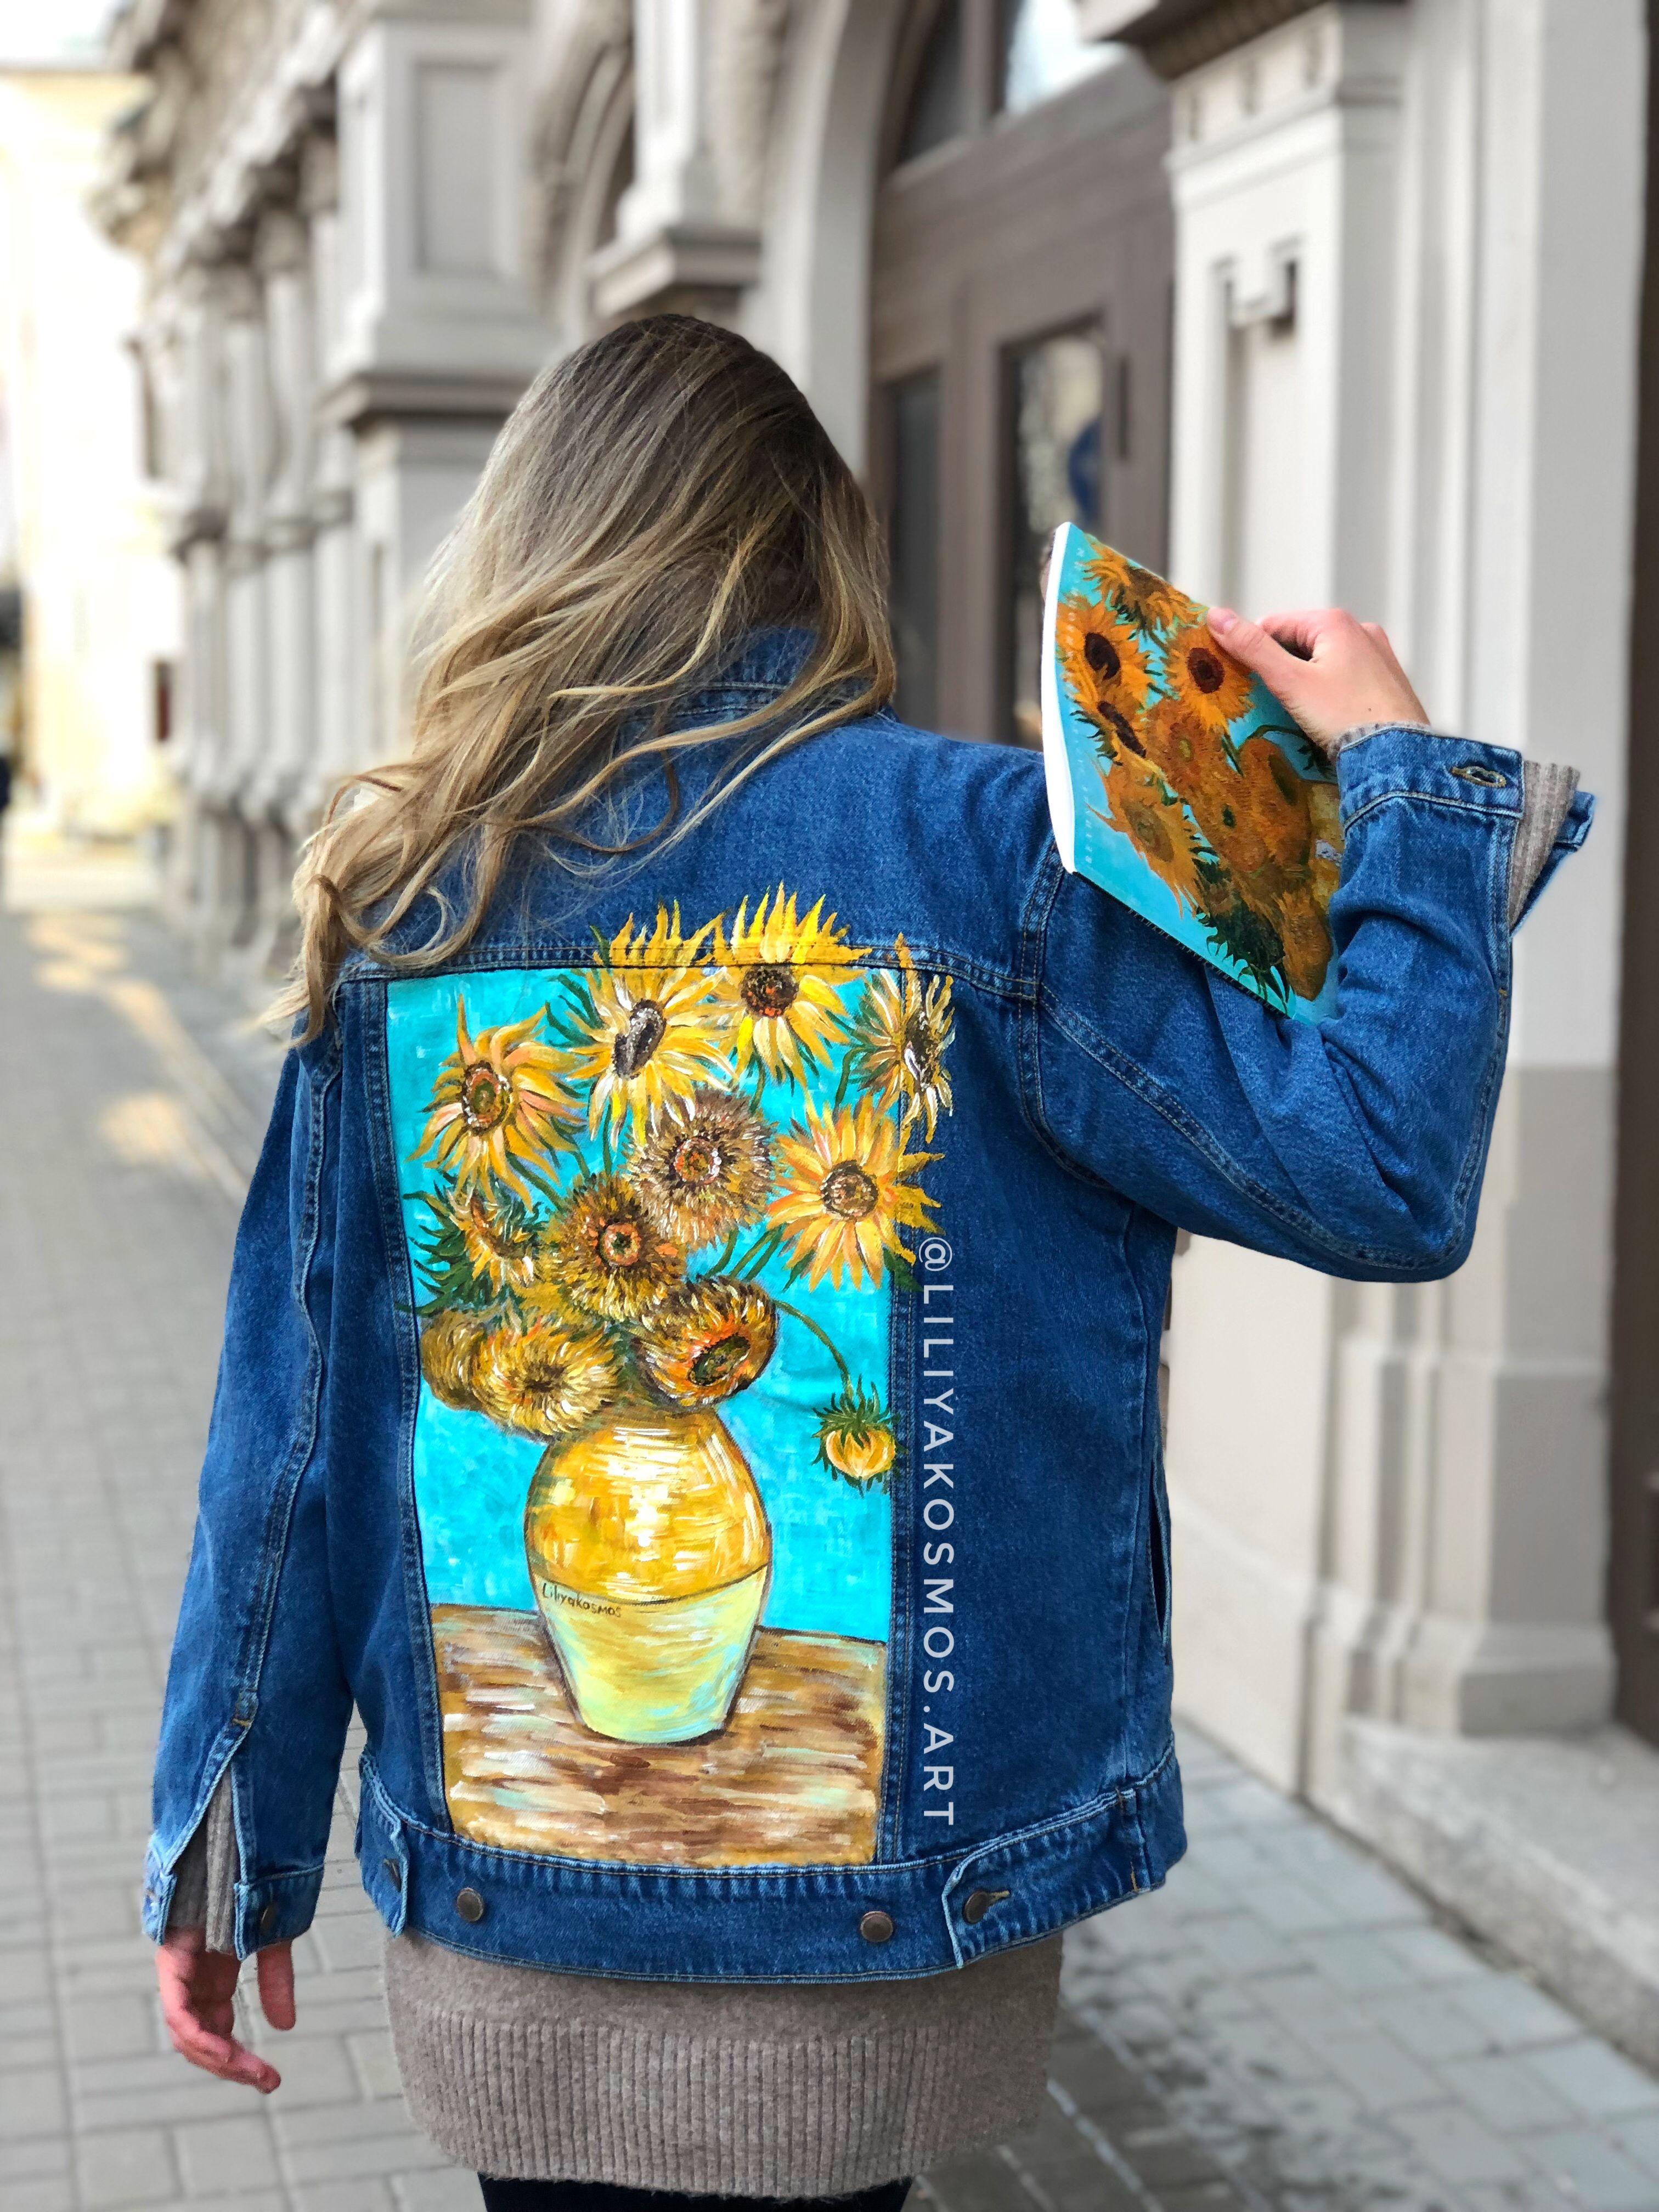 Pin On Painted Custom Denim Jackets By Liliyakosmos Art [ 4032 x 3024 Pixel ]